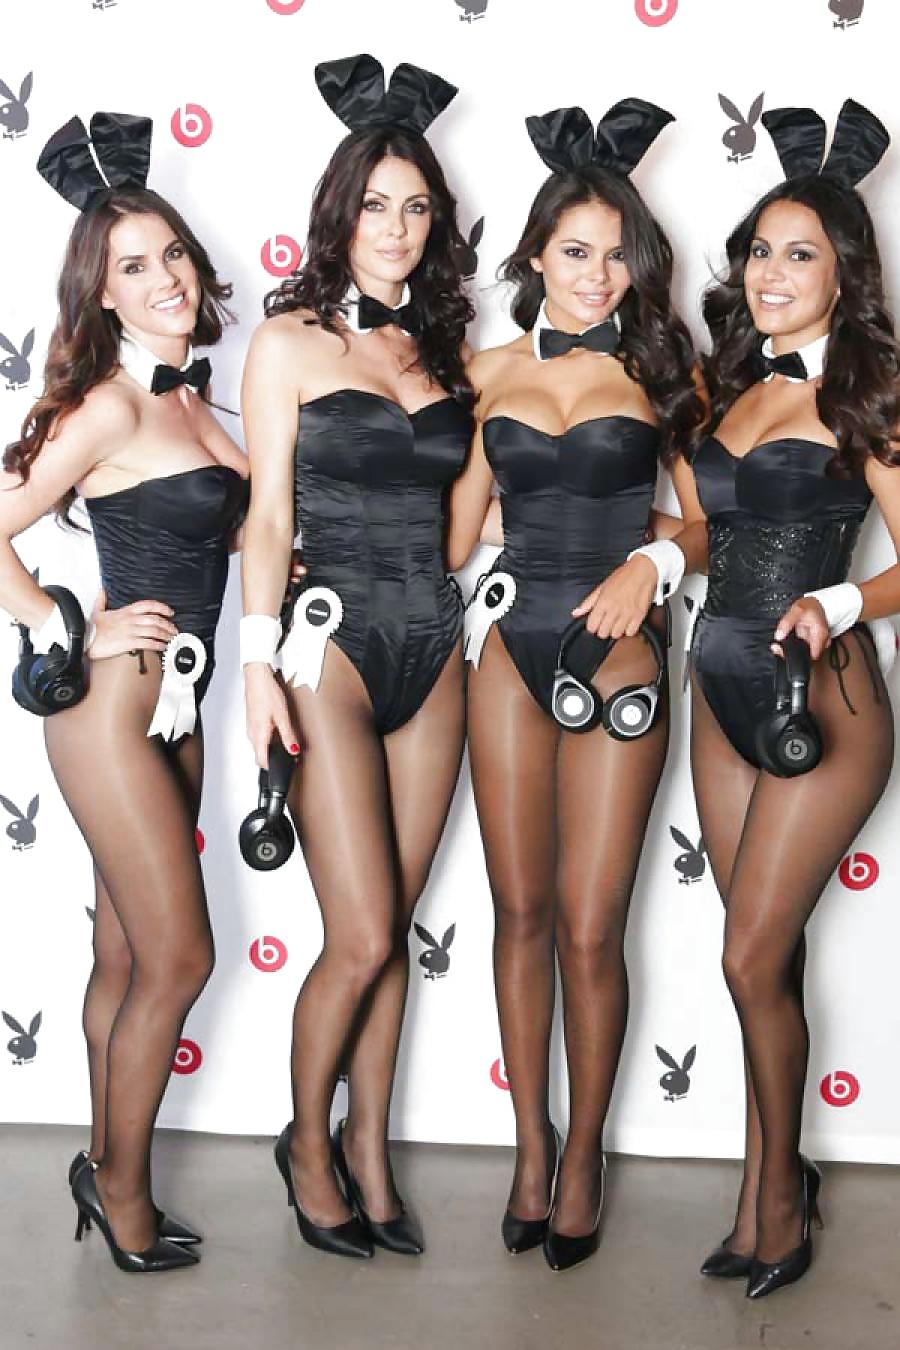 Playboy bunny homemade fuck